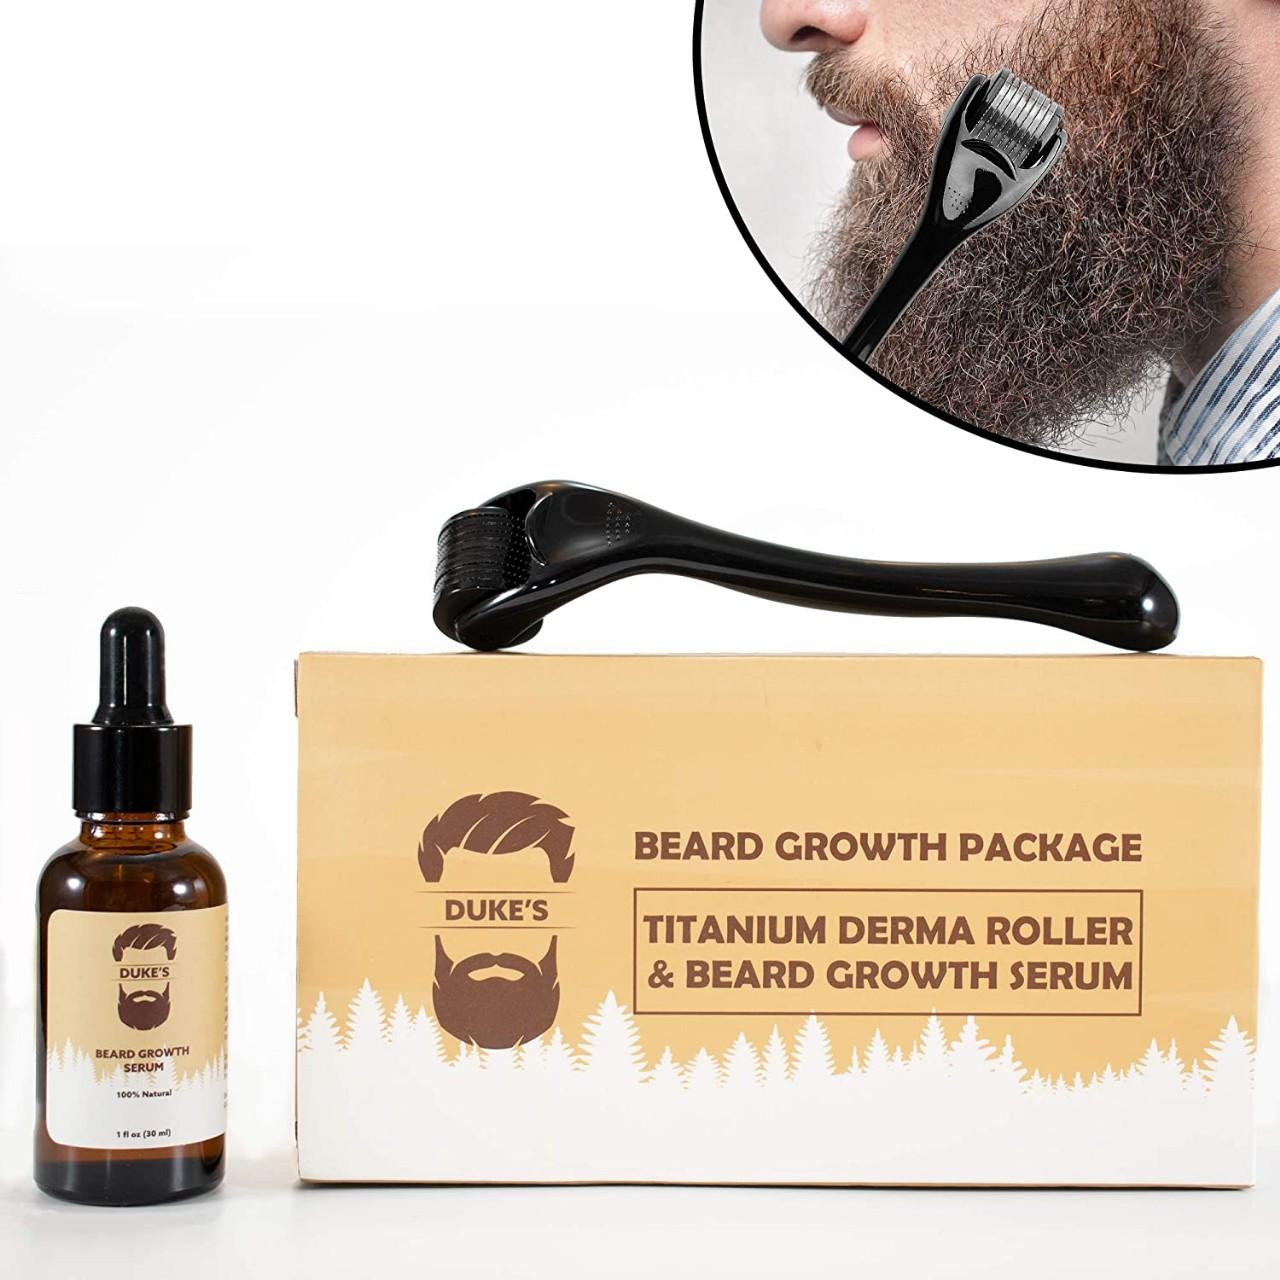 Beard Growth Kit - Derma Roller for Beard Growth and Beard Growth Serum - Stimulate Beard and Hair